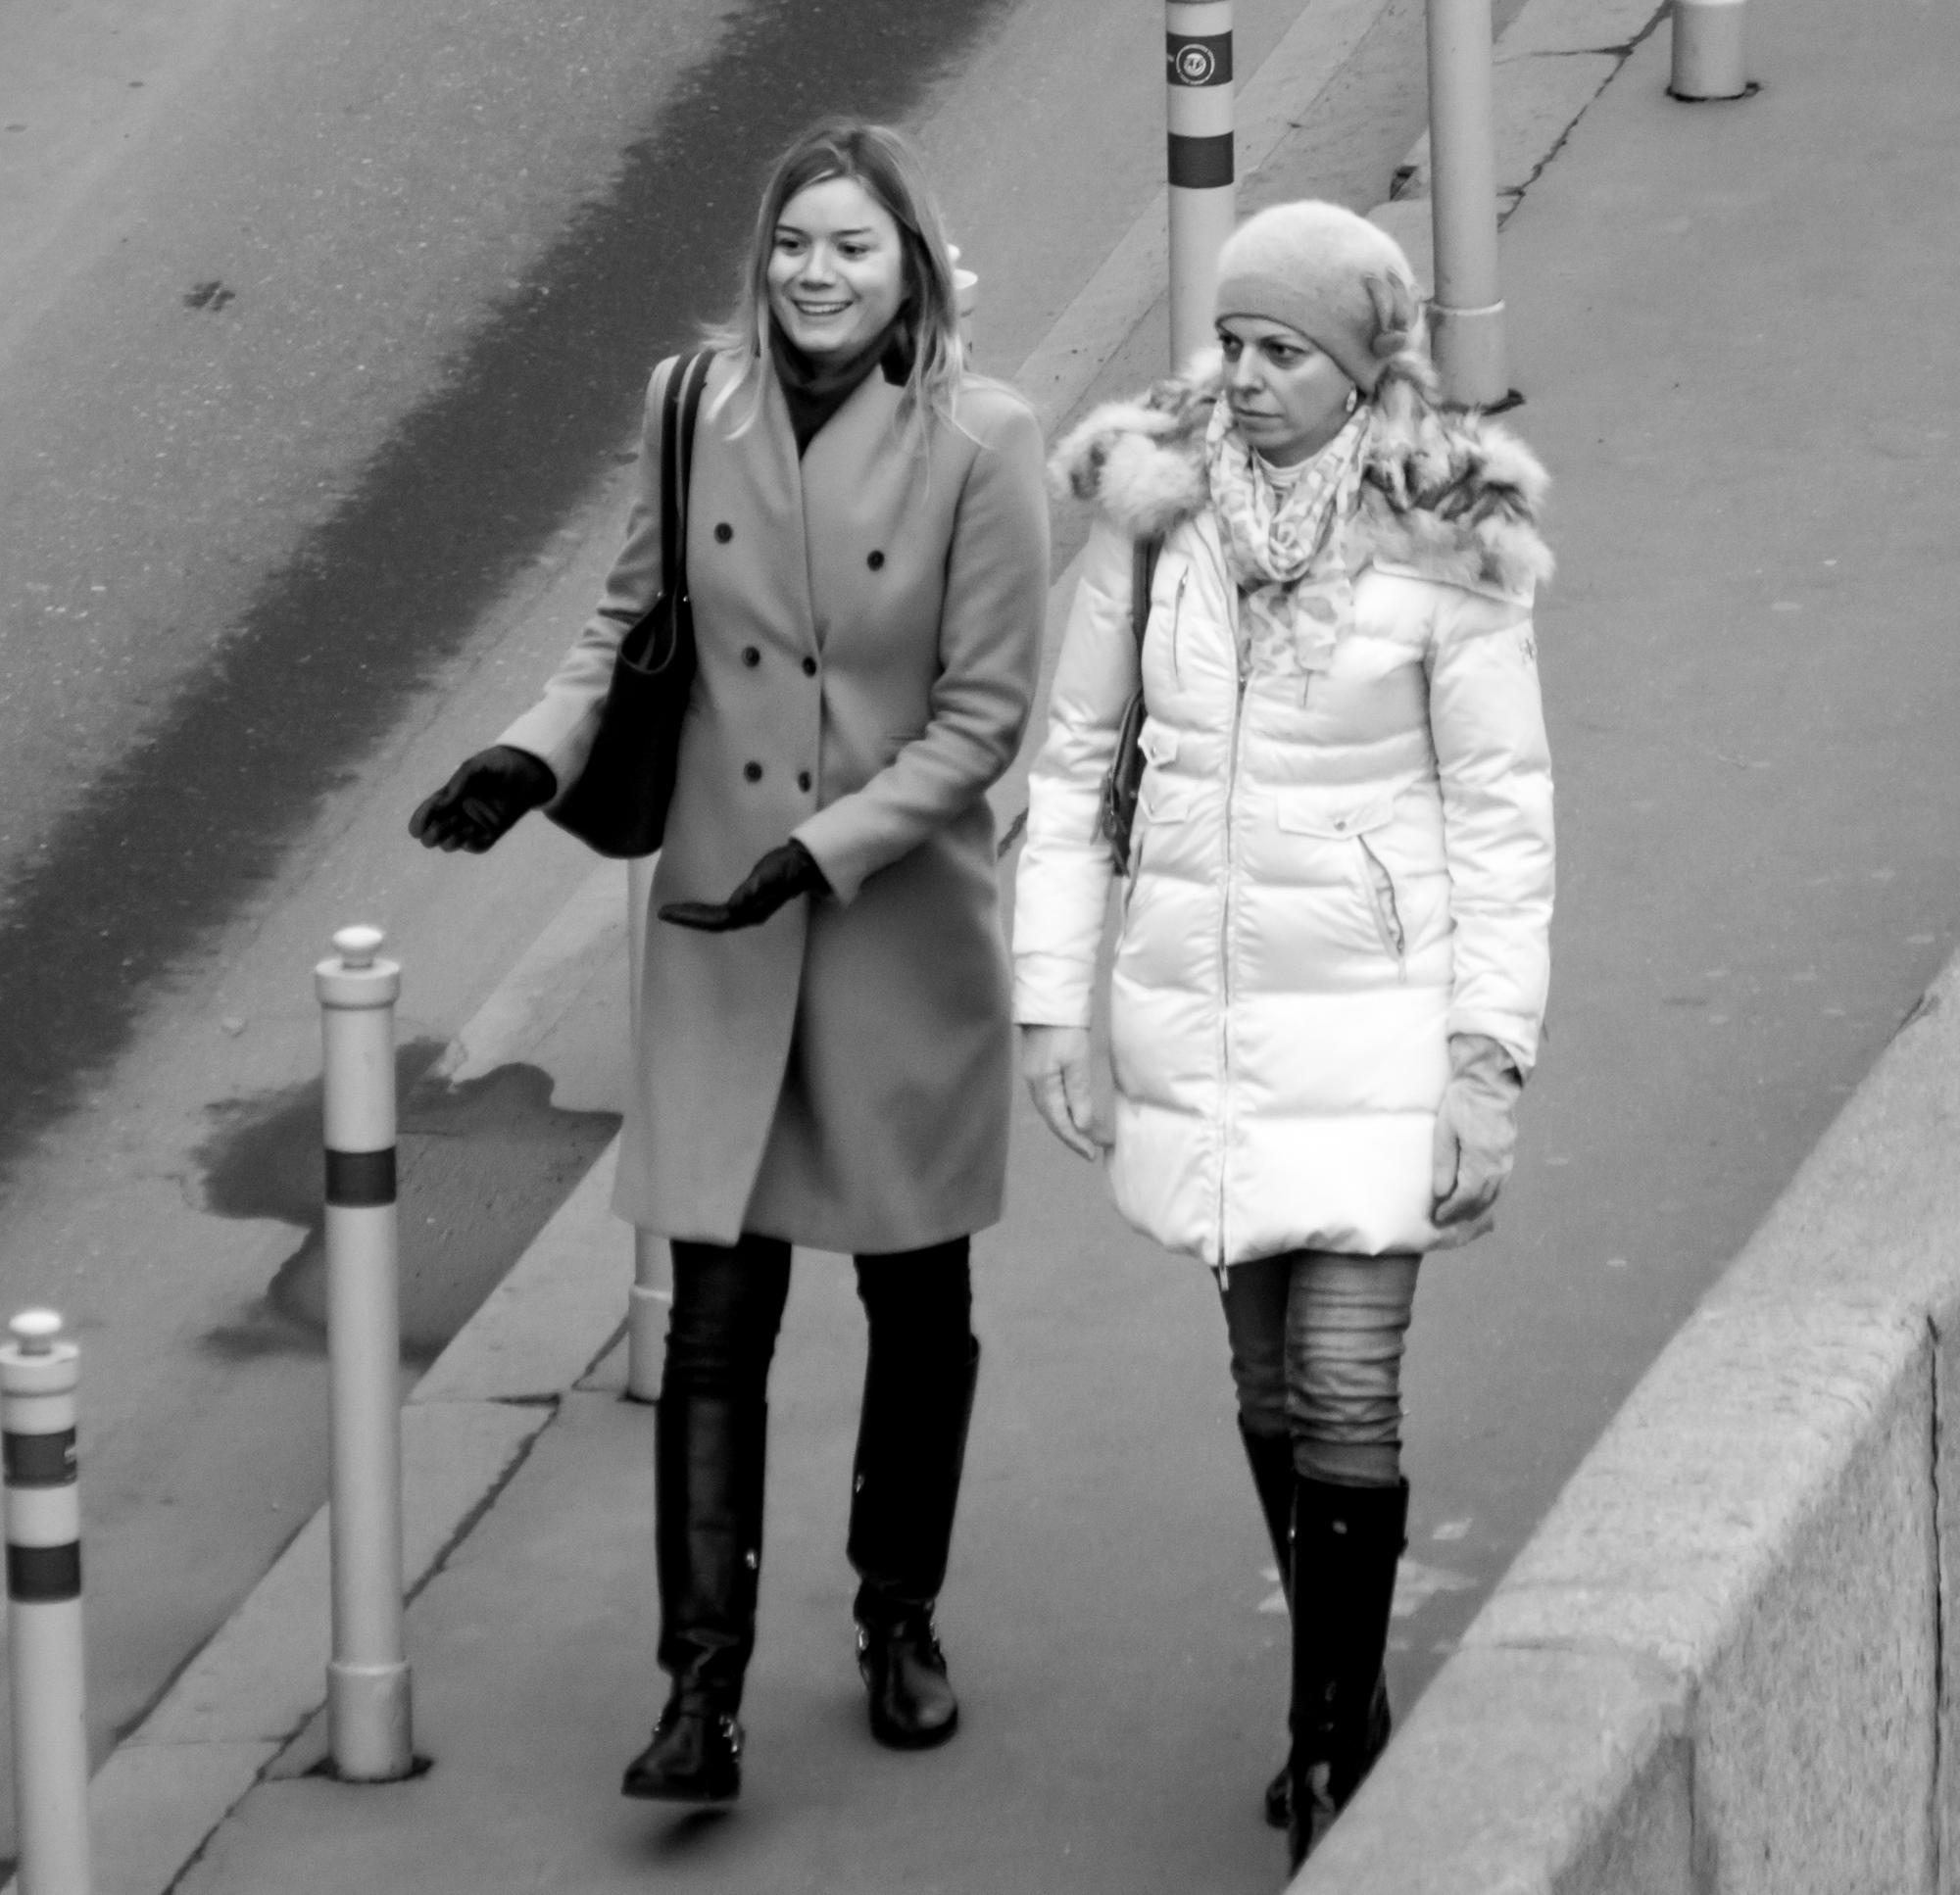 On the walk